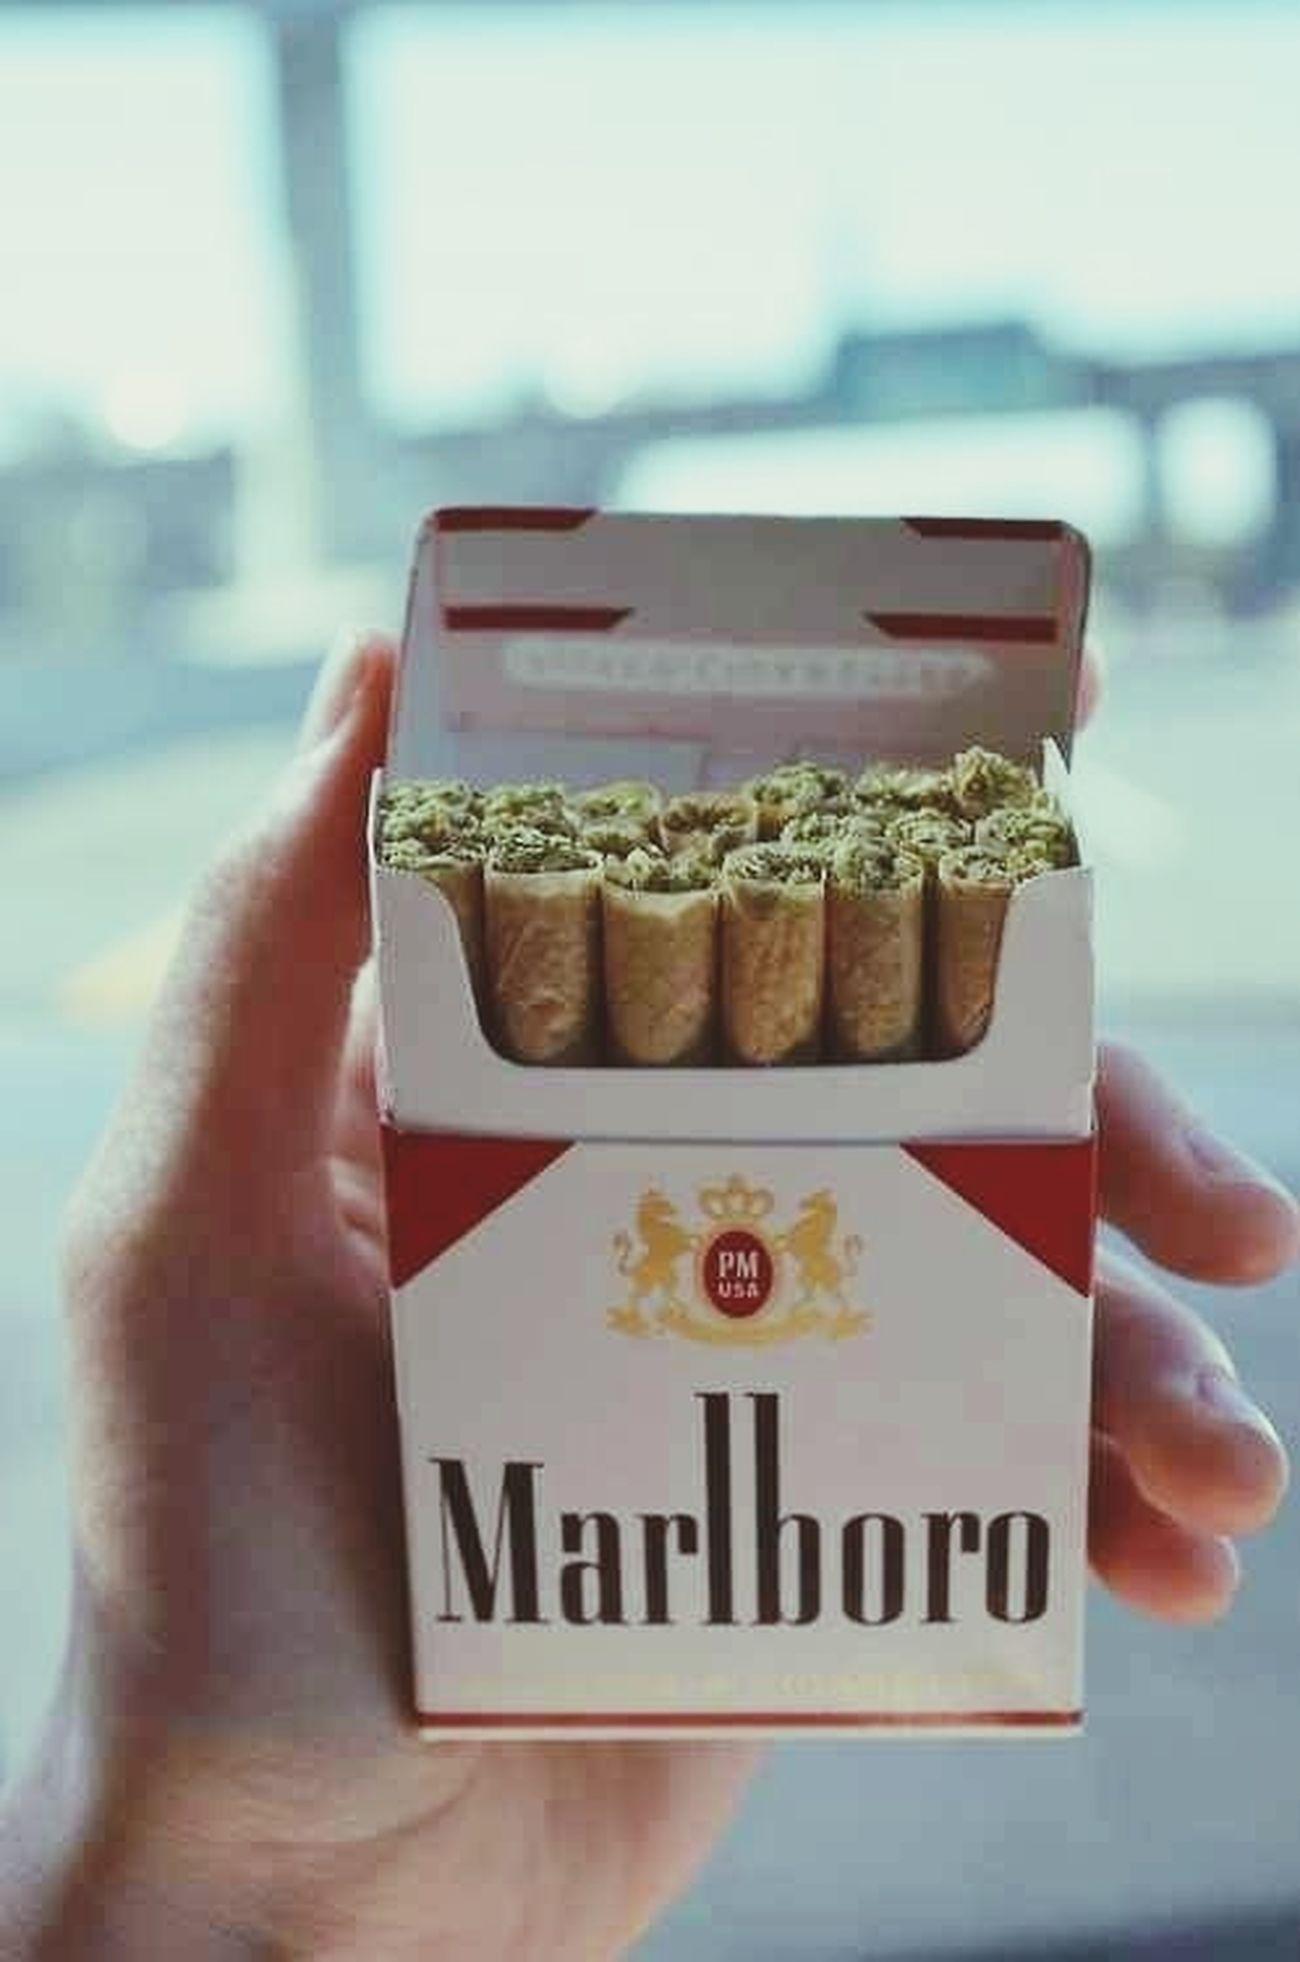 Smoke Malrboro